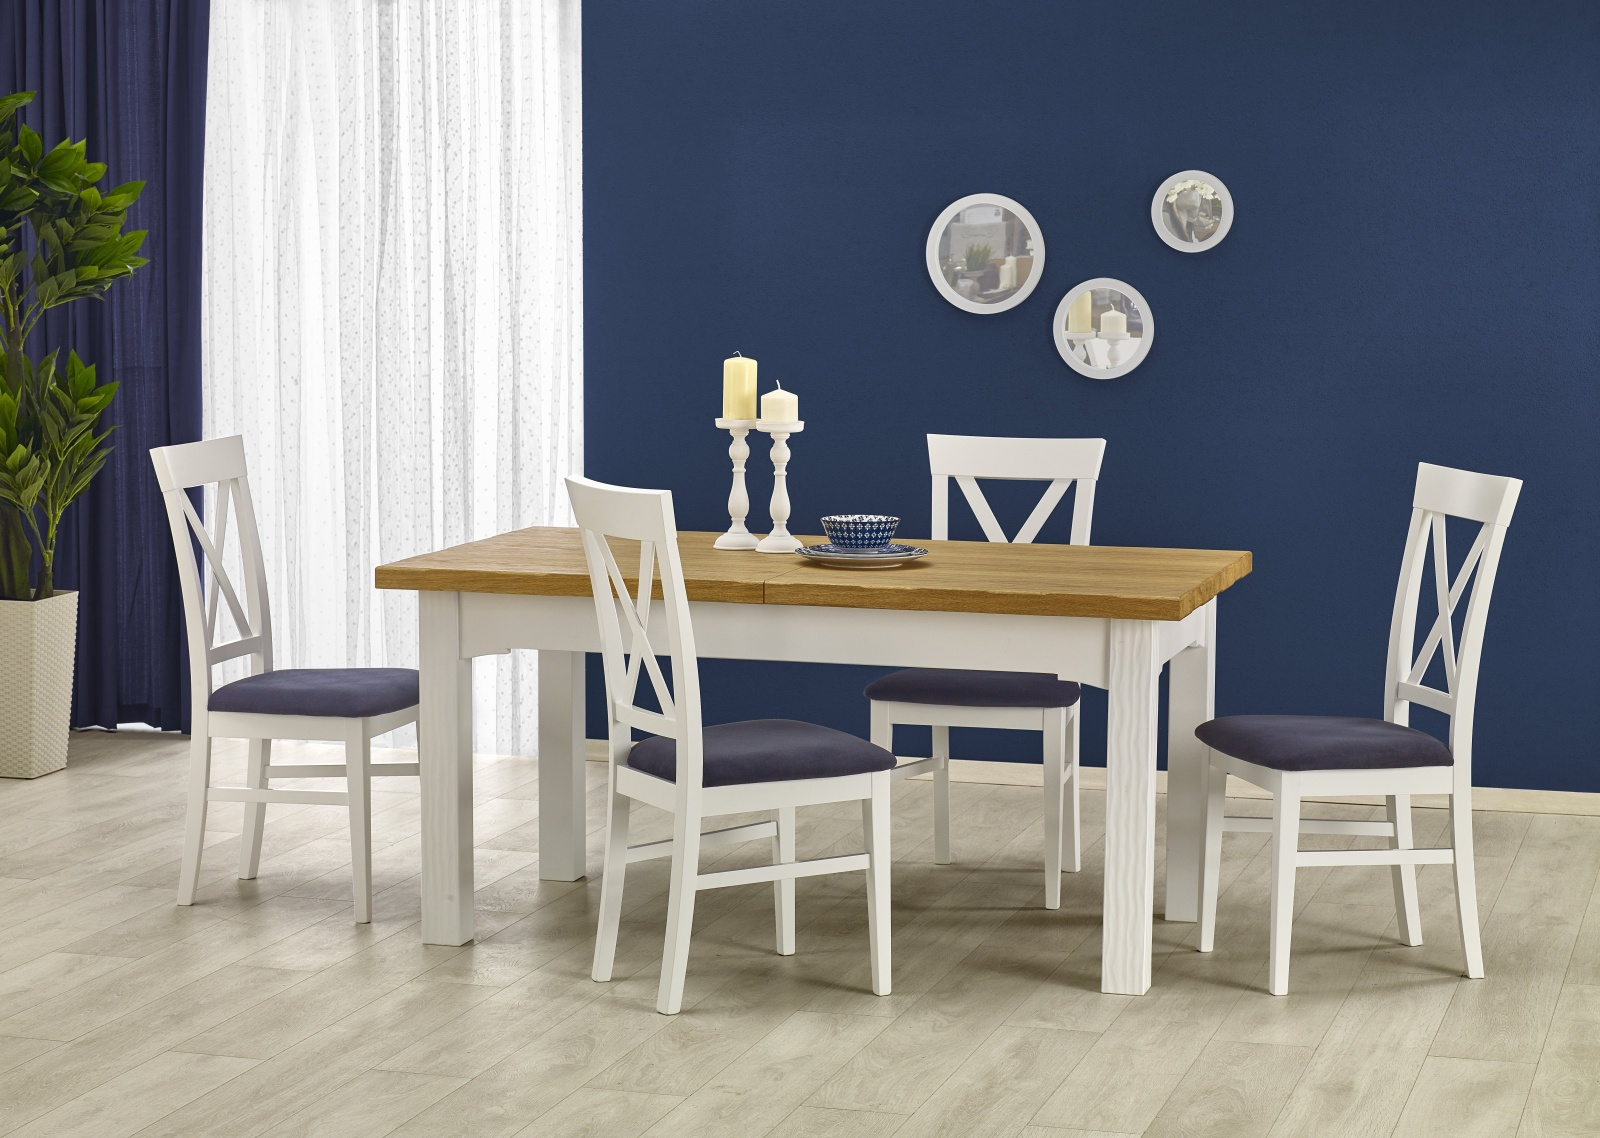 Halmar Jídelní stůl rozkládací LEONARDO 160/250x90 cm, bílý/dub medový